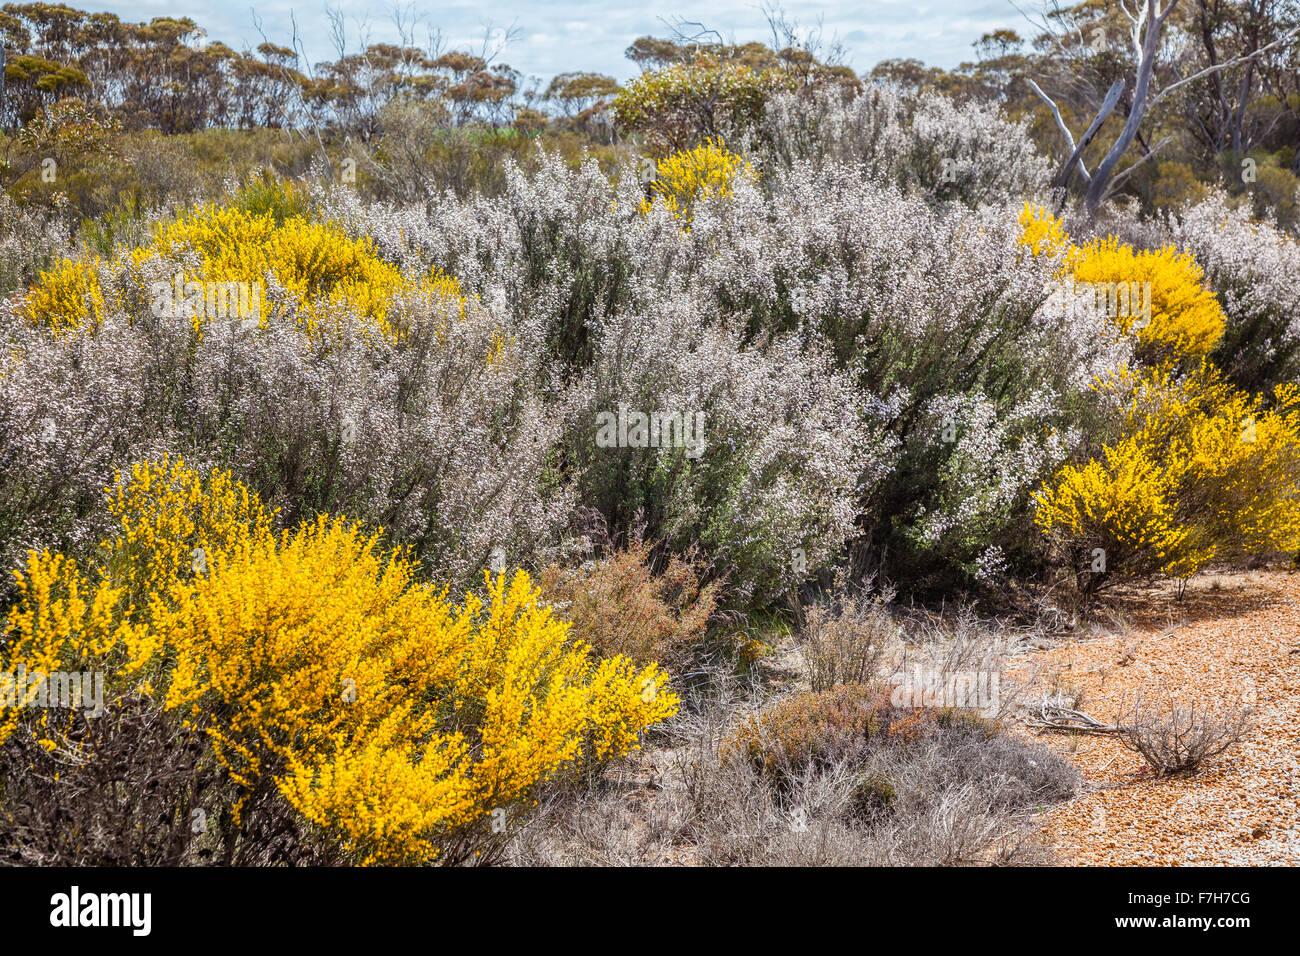 Australia, Western Australia, Great Southern, Eastern Wheatbelt region; spring flowering bush landscape - Stock Image